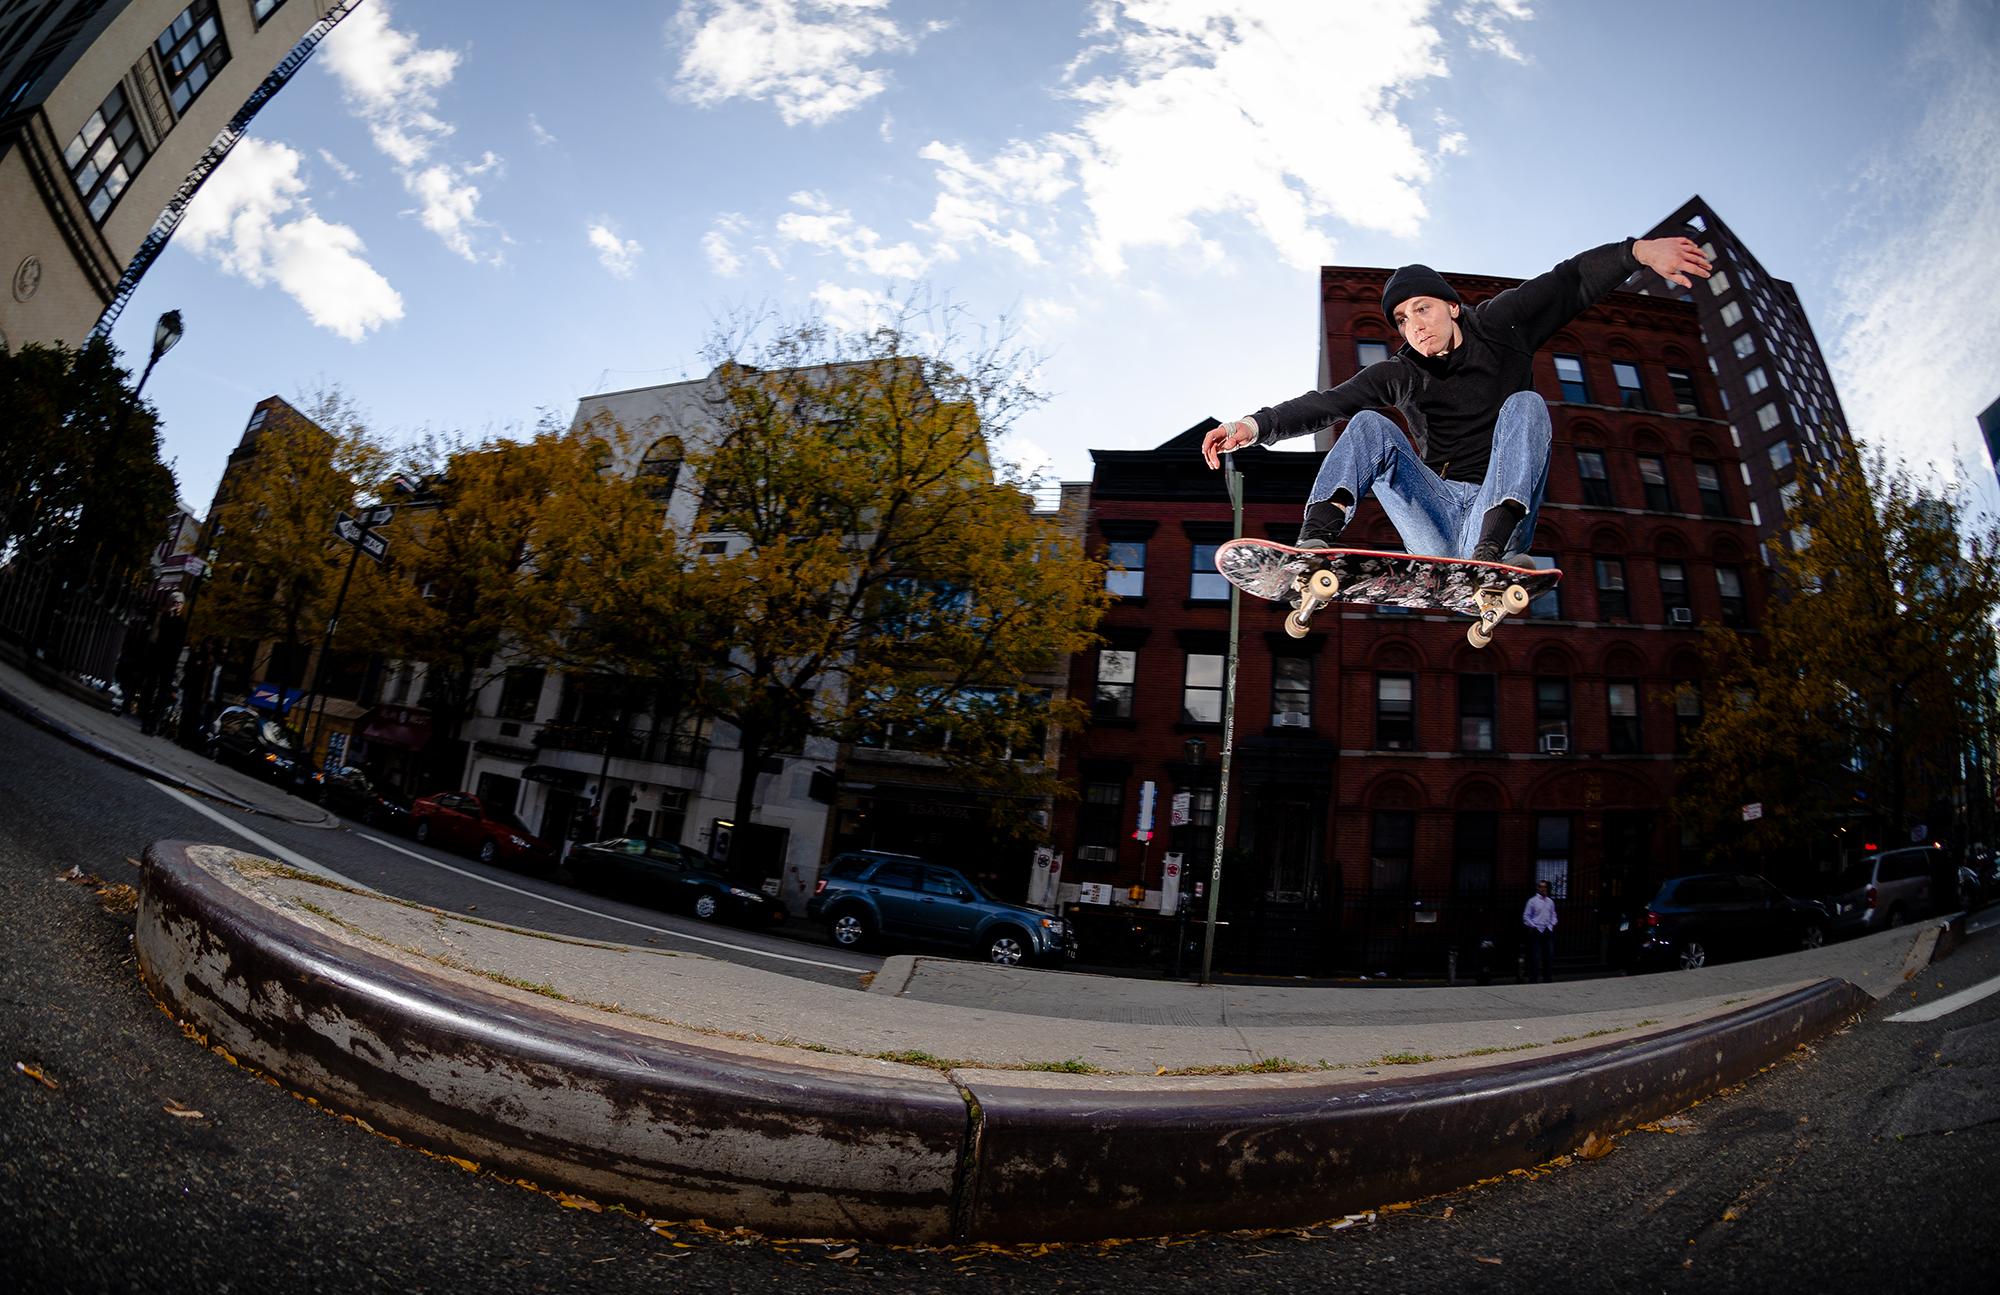 Ben Kadow | Ollie | Manhattan, NY